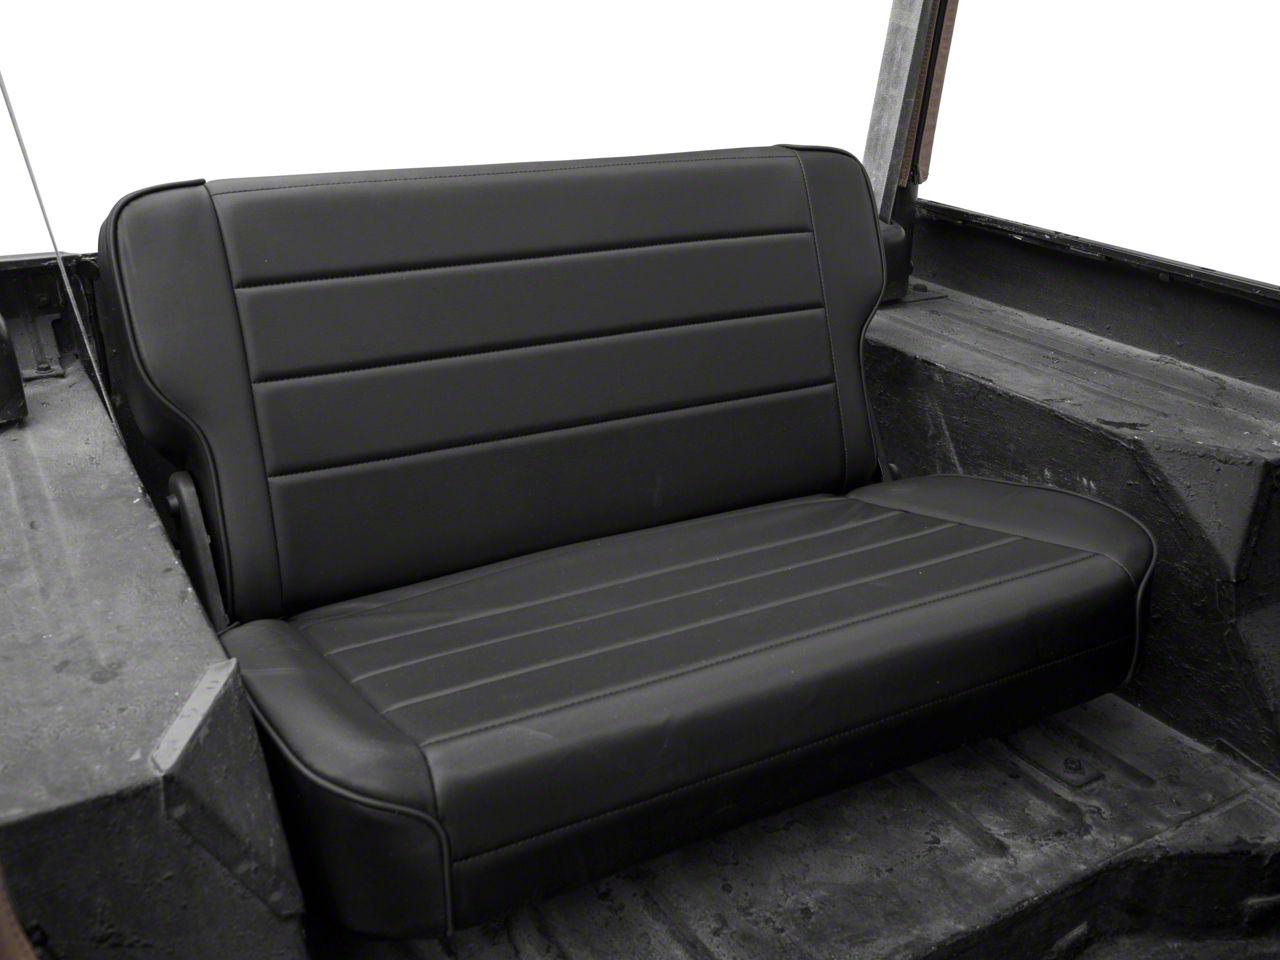 Smittybilt Rear Fold & Tumble Seat - Black Denim (87-95 Jeep Wrangler YJ)